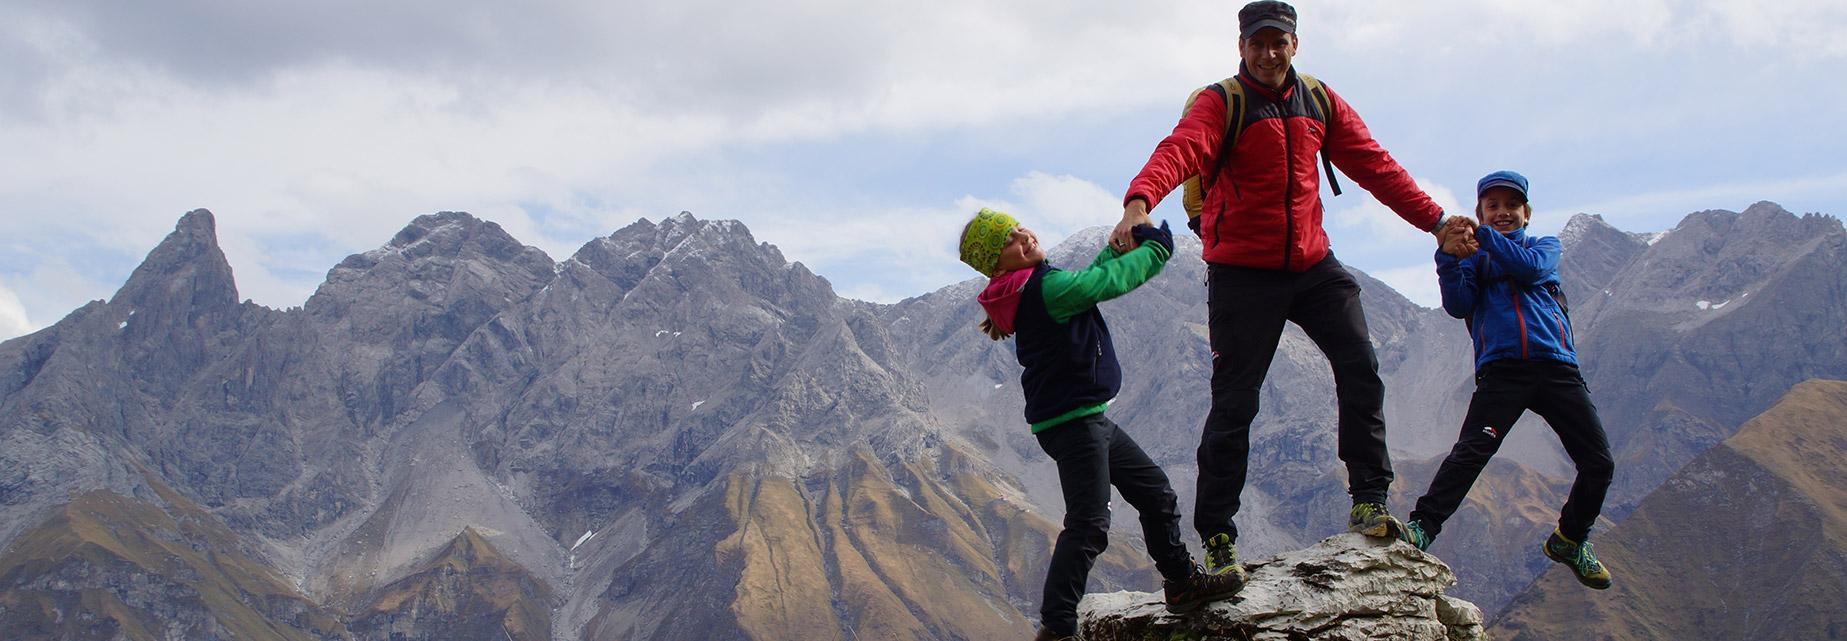 Familienurlaub in Oberjoch im Allgäu